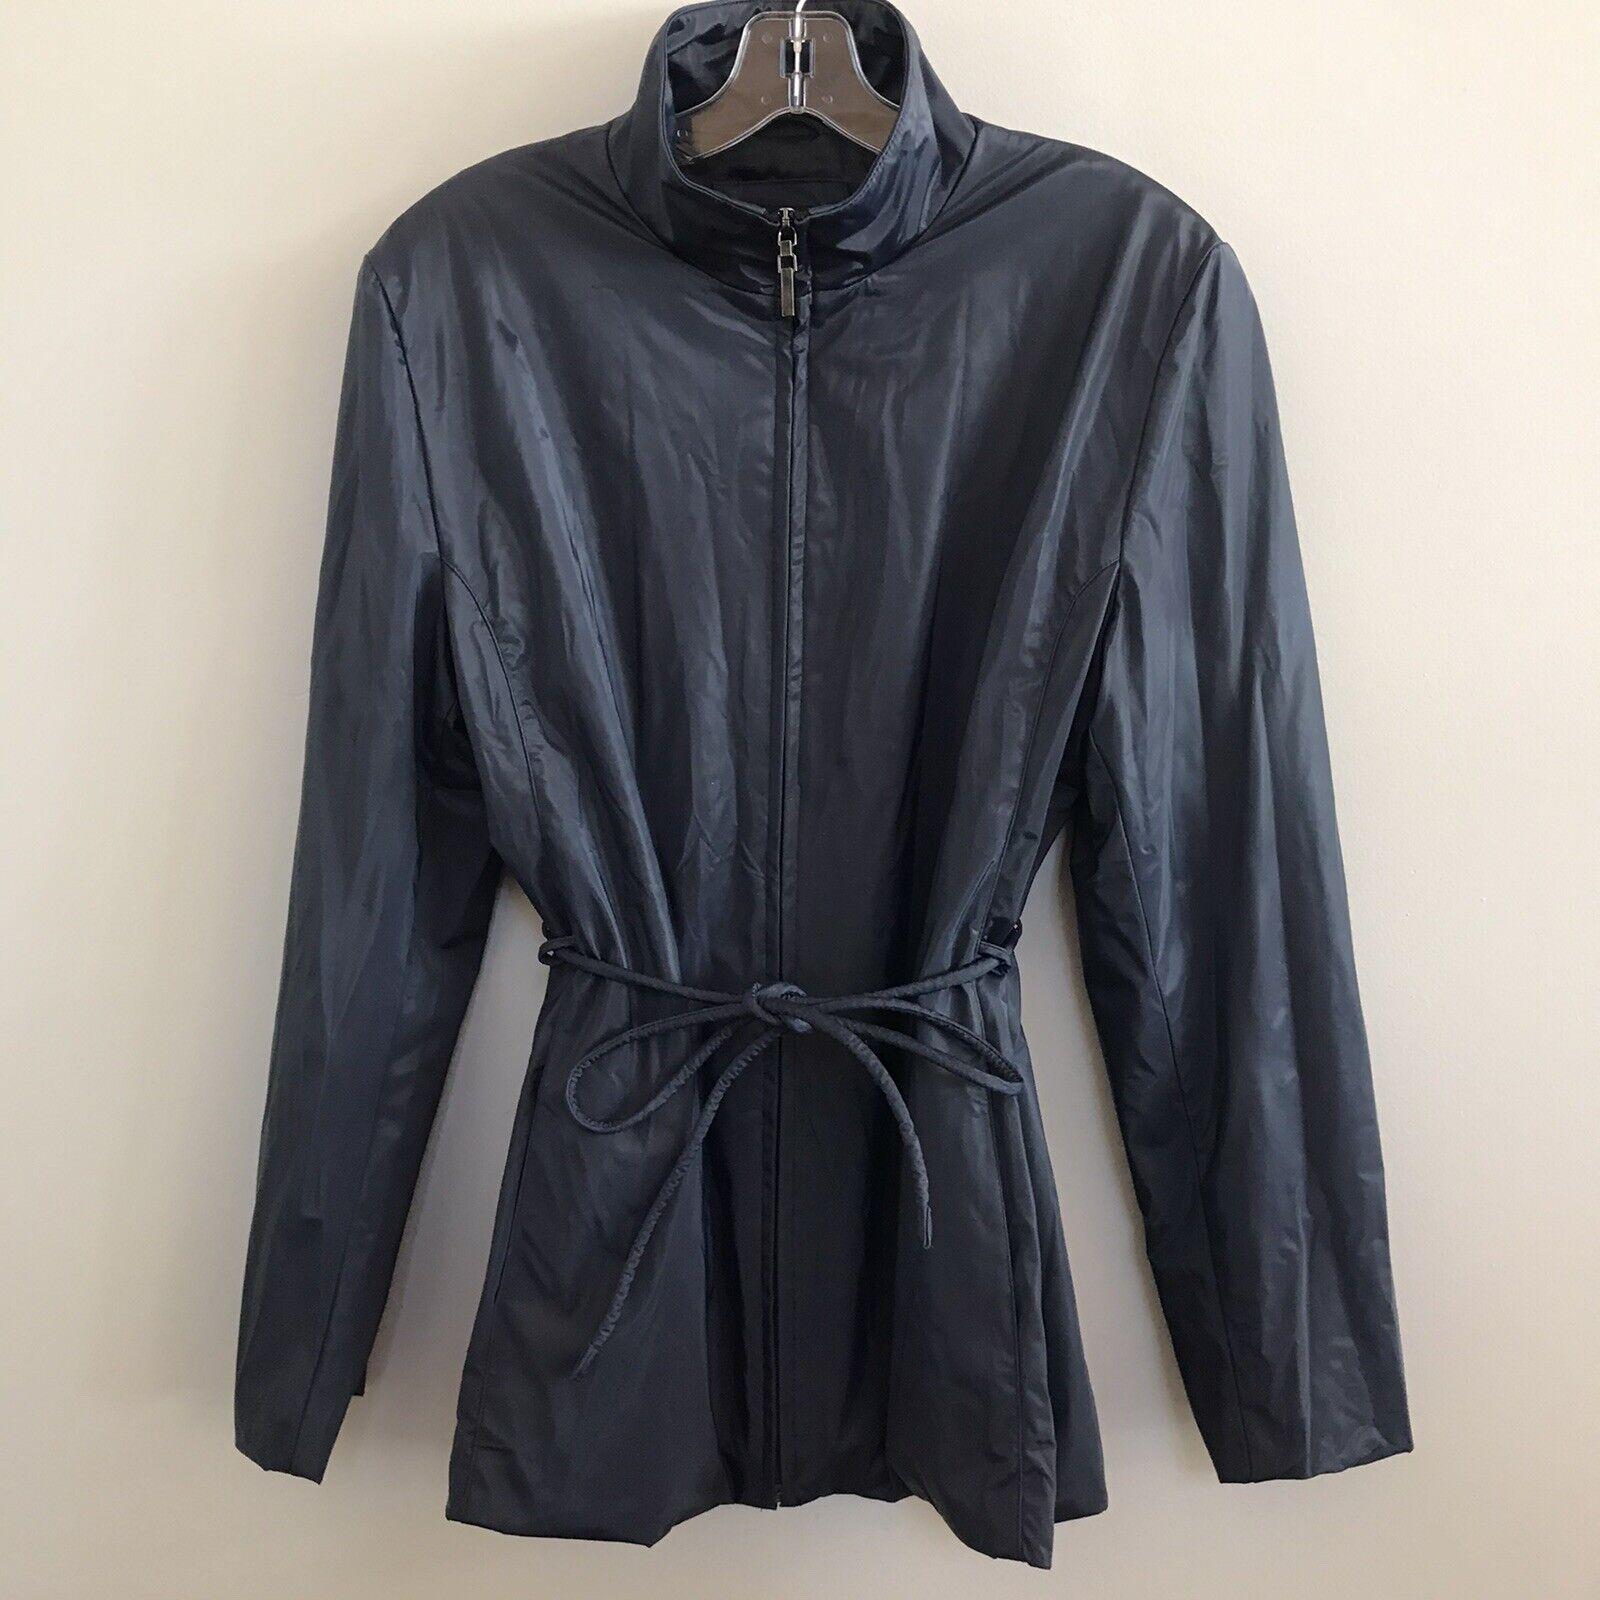 JLC New York women's size L NAVY BLUE RAINCOAT Outerwear Belt Rain Coat Jacket